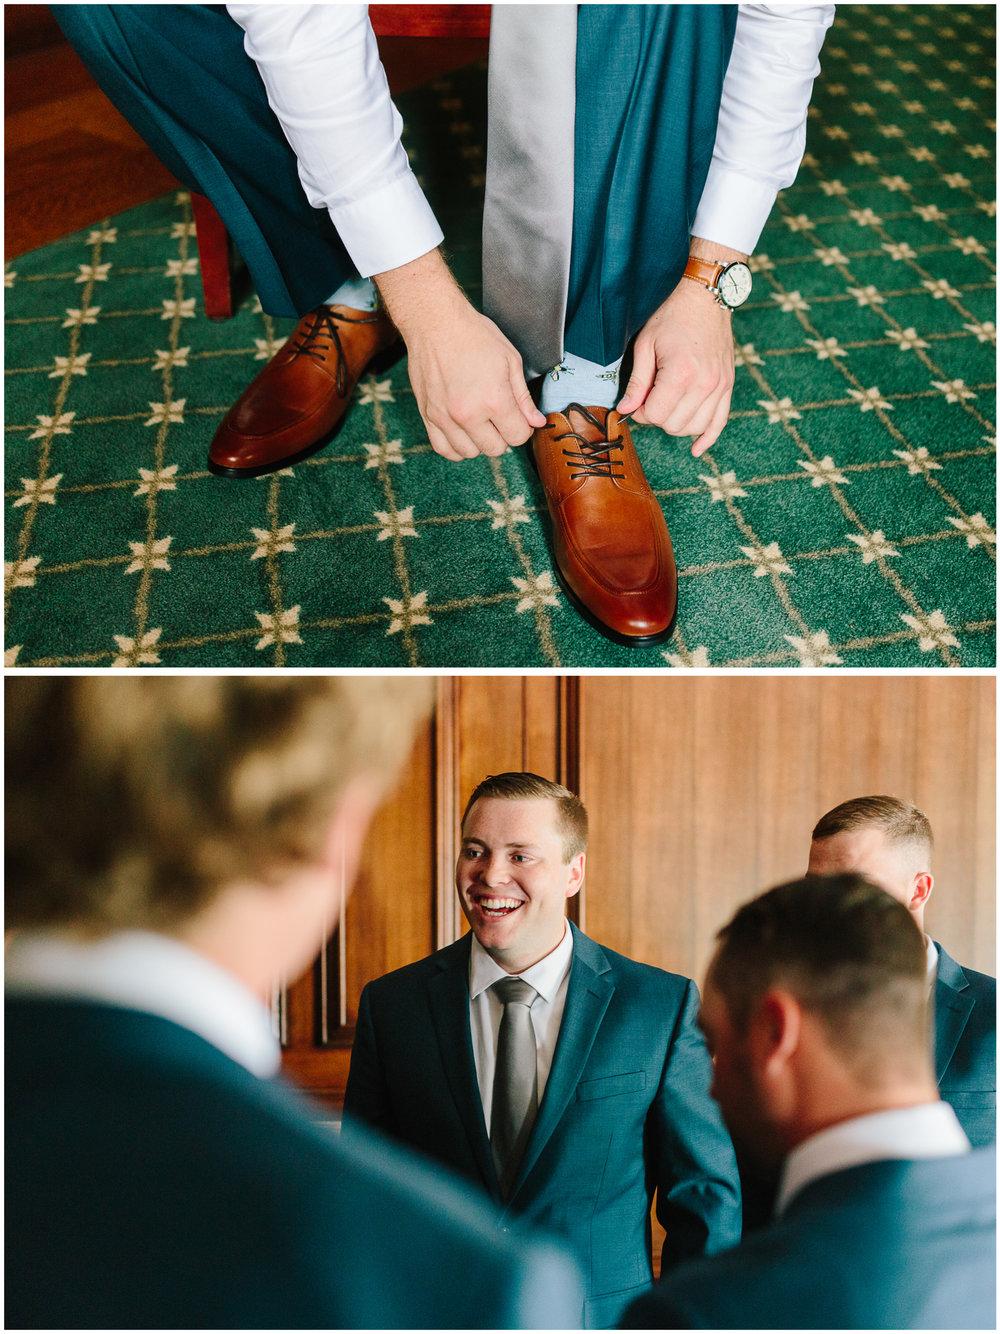 ann_arbor_michigan_wedding_27.jpg